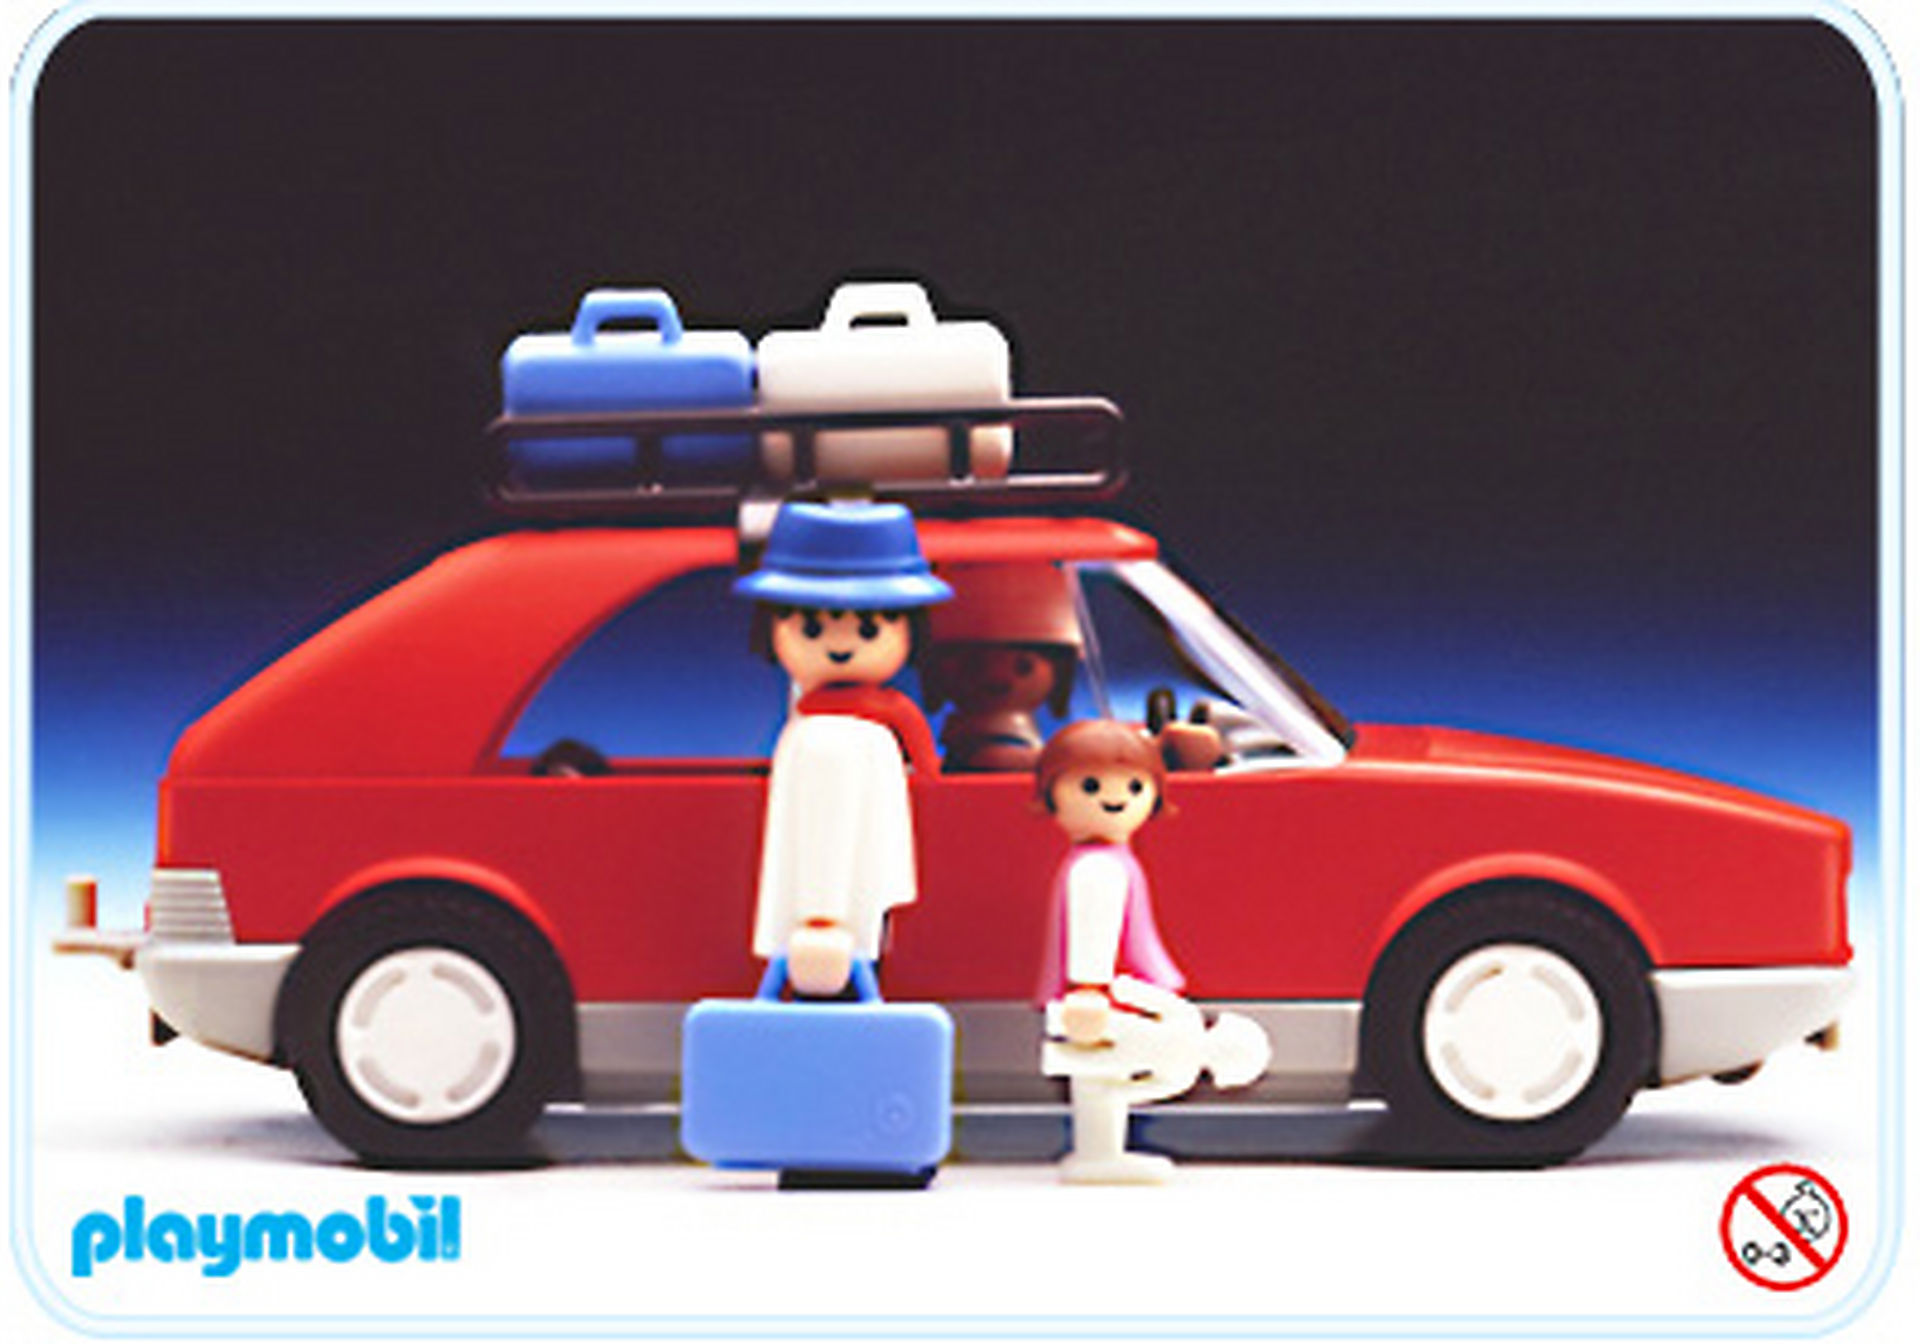 http://media.playmobil.com/i/playmobil/3139-B_product_detail/Voiture de tourisme